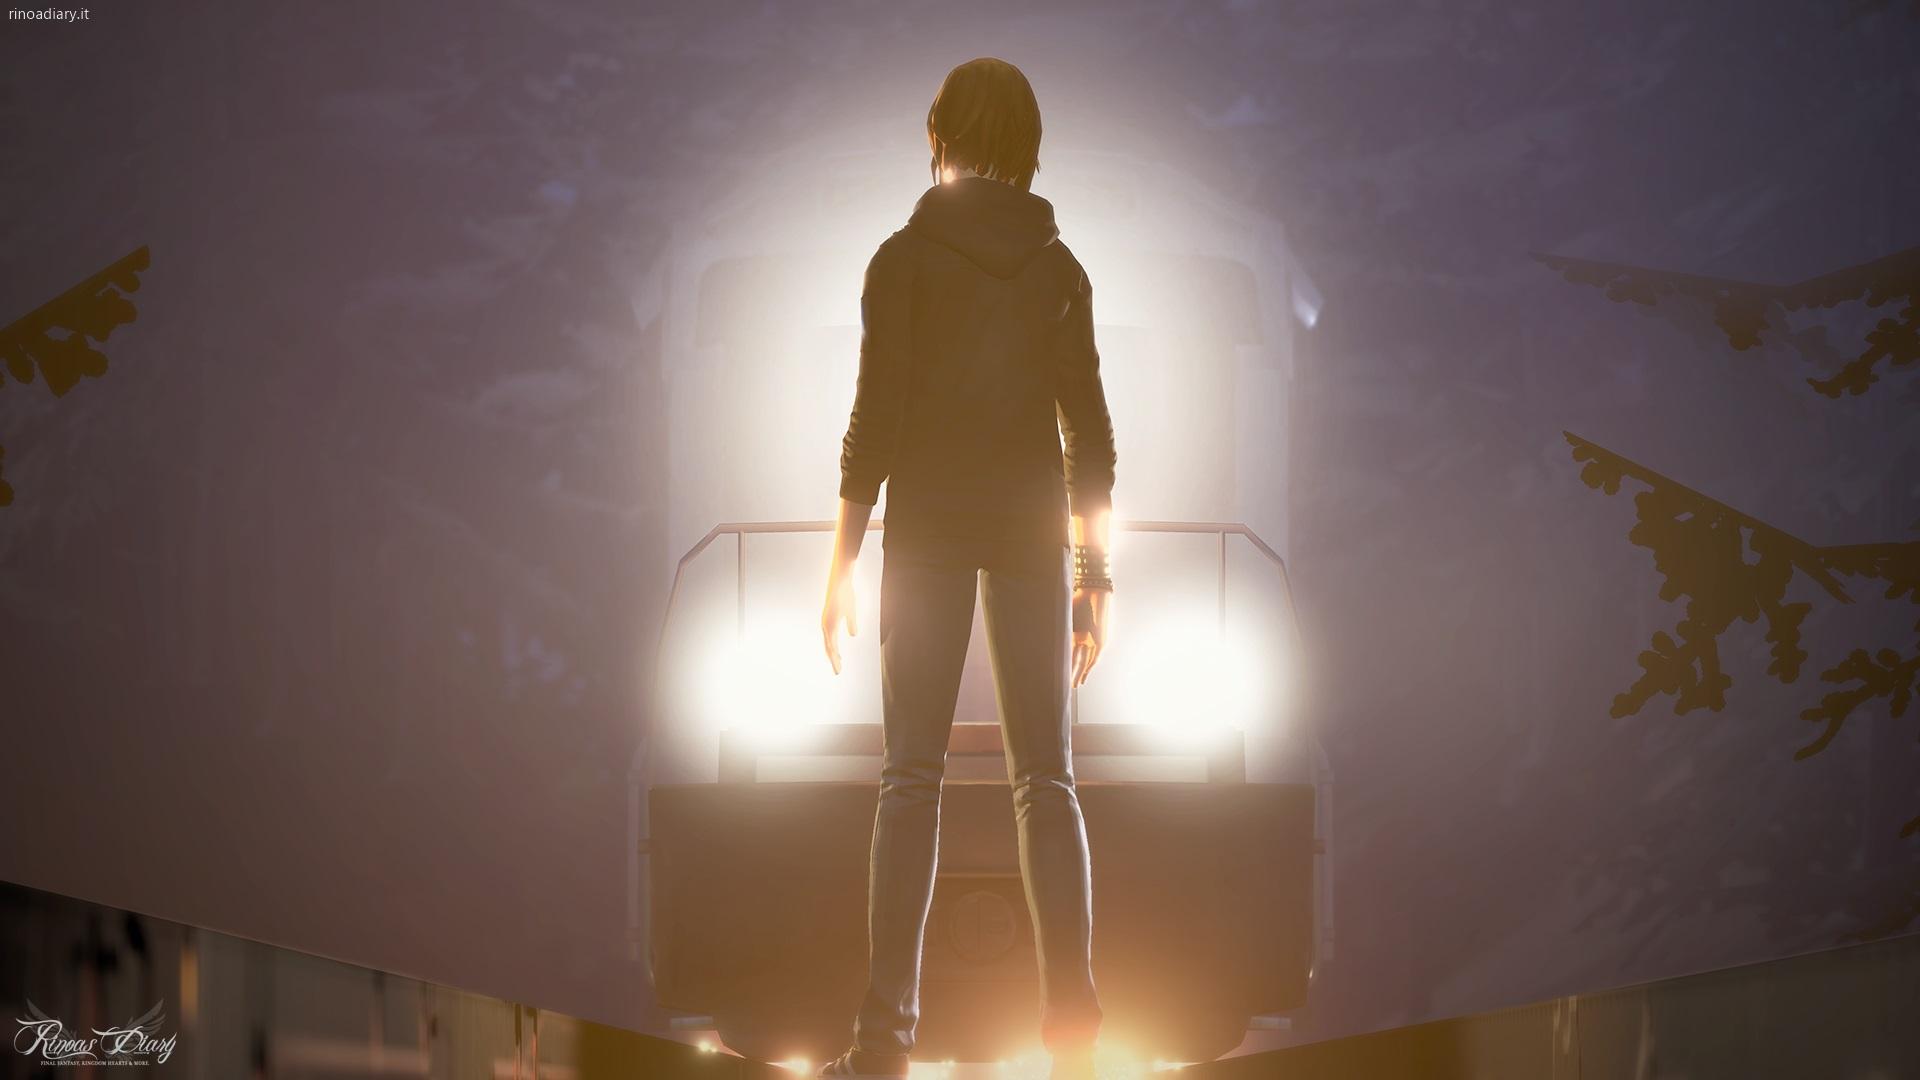 Svelati i requisiti di sistema di Life is Strange: Before the Storm (versione Steam)!